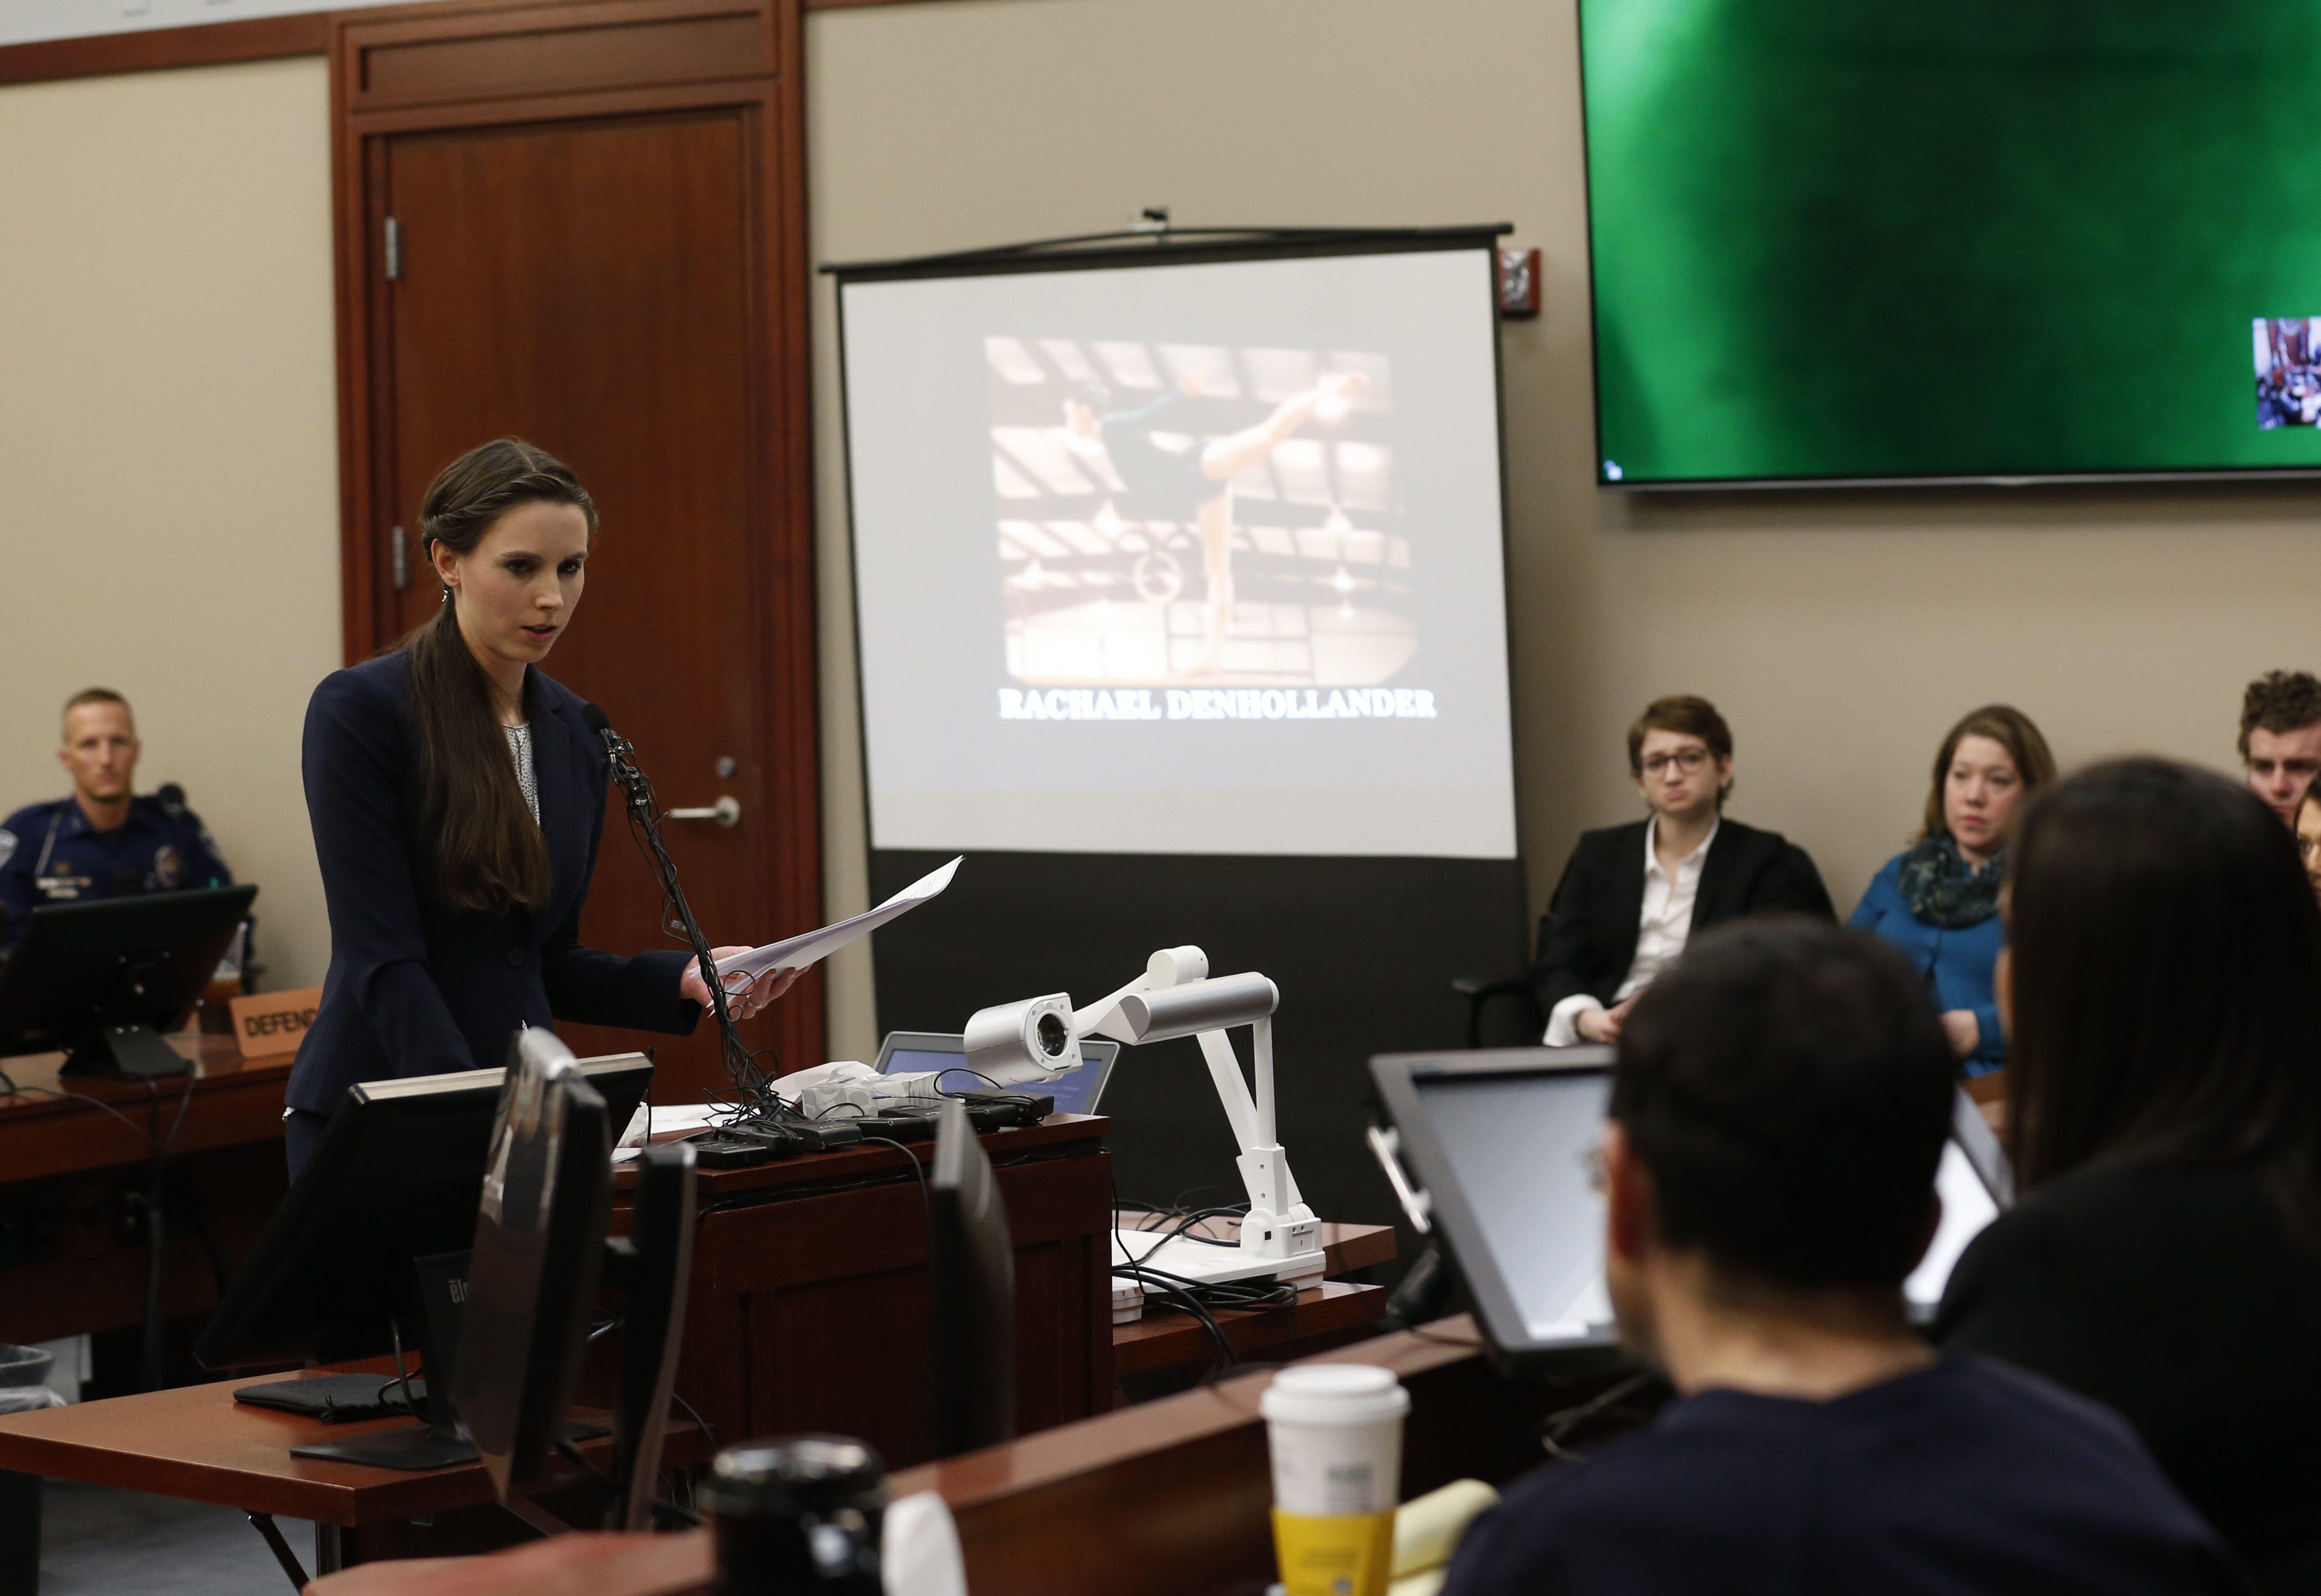 Rachael Denhollander, Larry Nassar trial, sentencing hearing, court